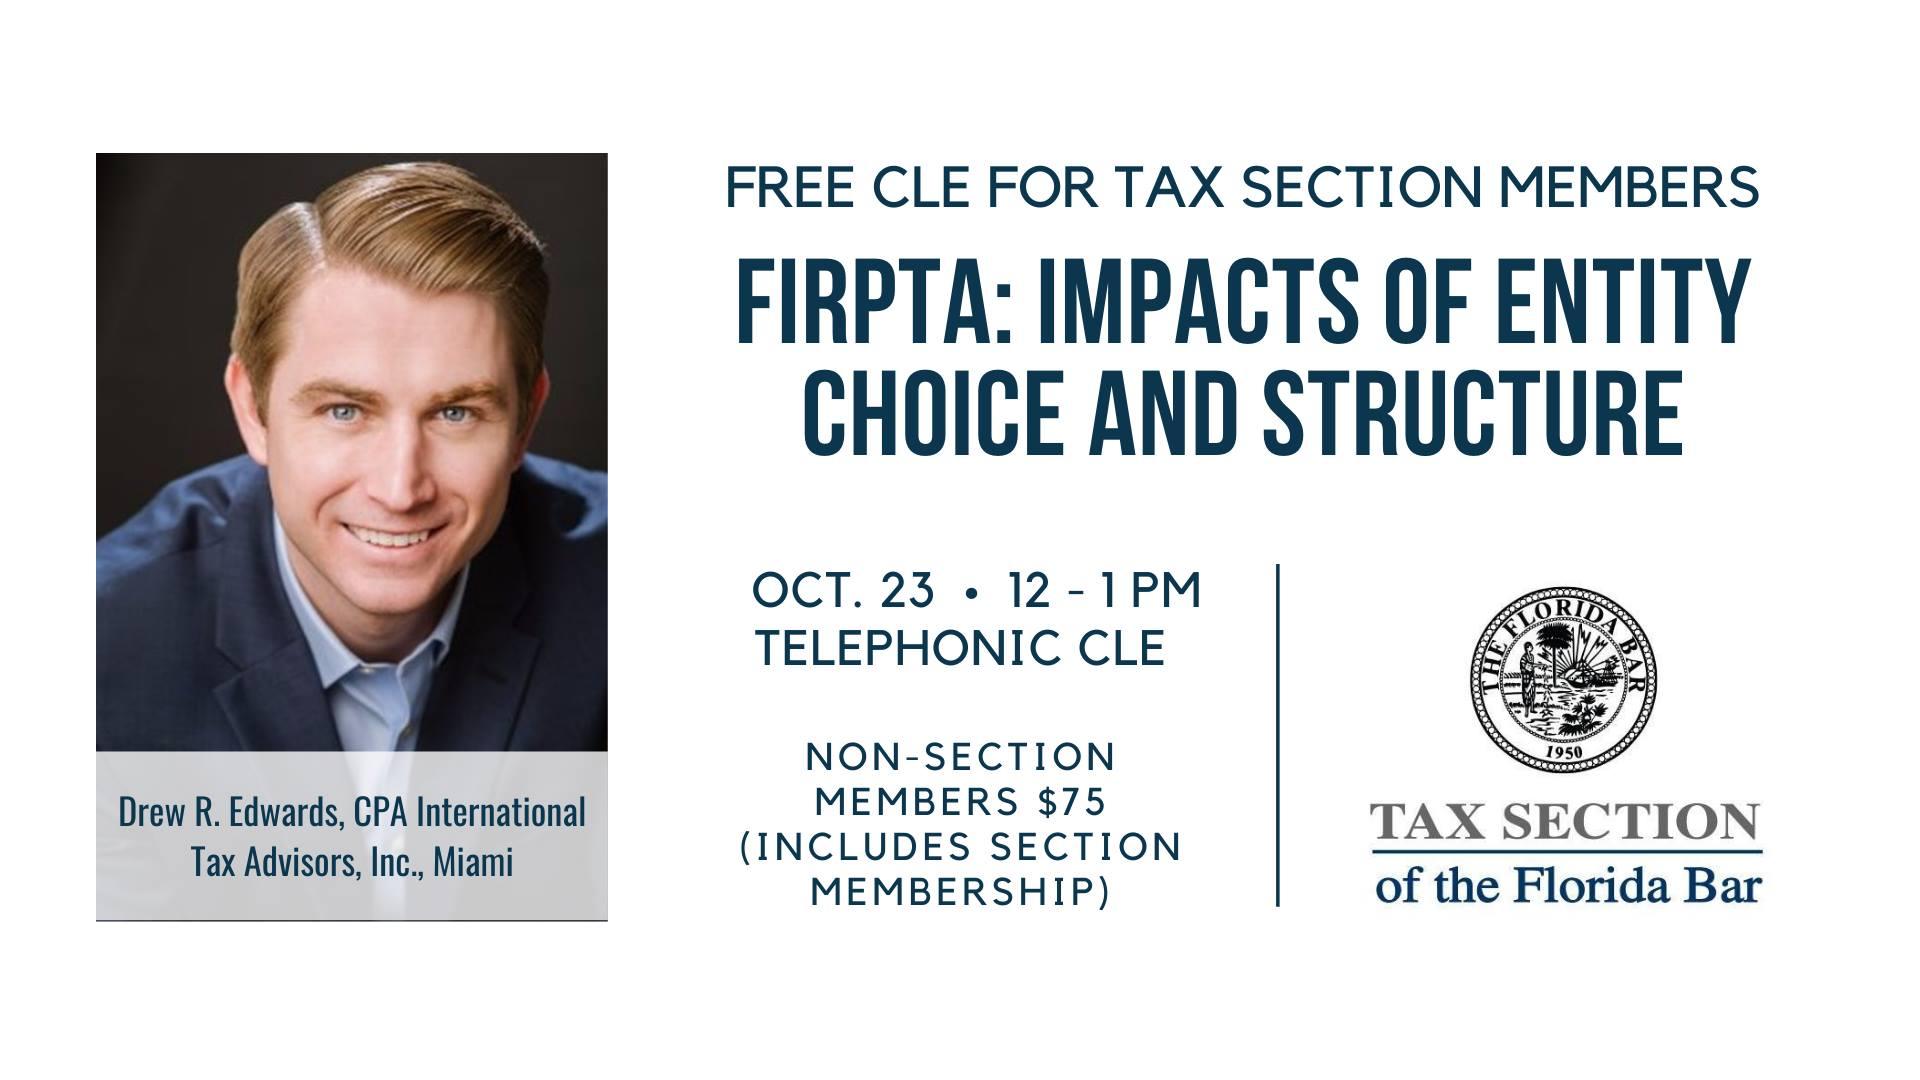 Florida bar CLE FIRPTA entity choice international tax advisors international tax accountant CPA miami doral ft. lauderdale drew edwards